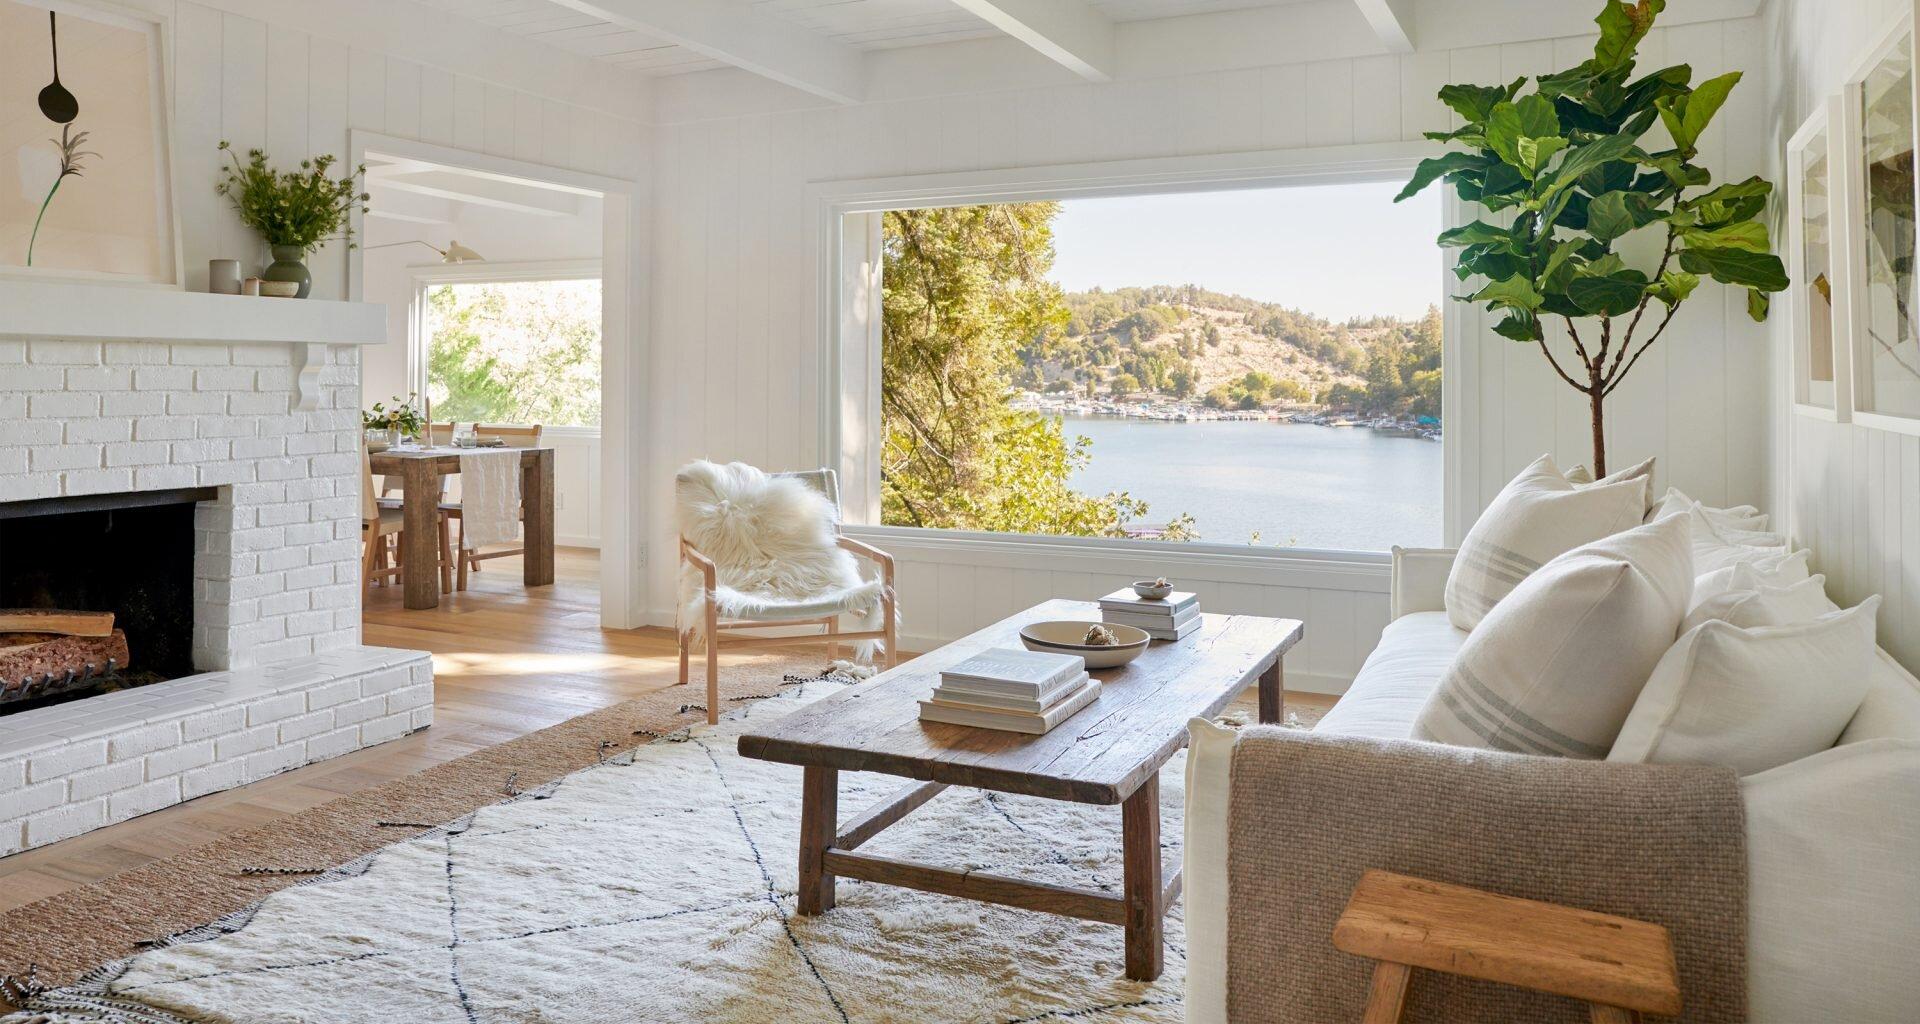 Jenni Kayne Lake House - Living Room with Views of Lake Arrowhead